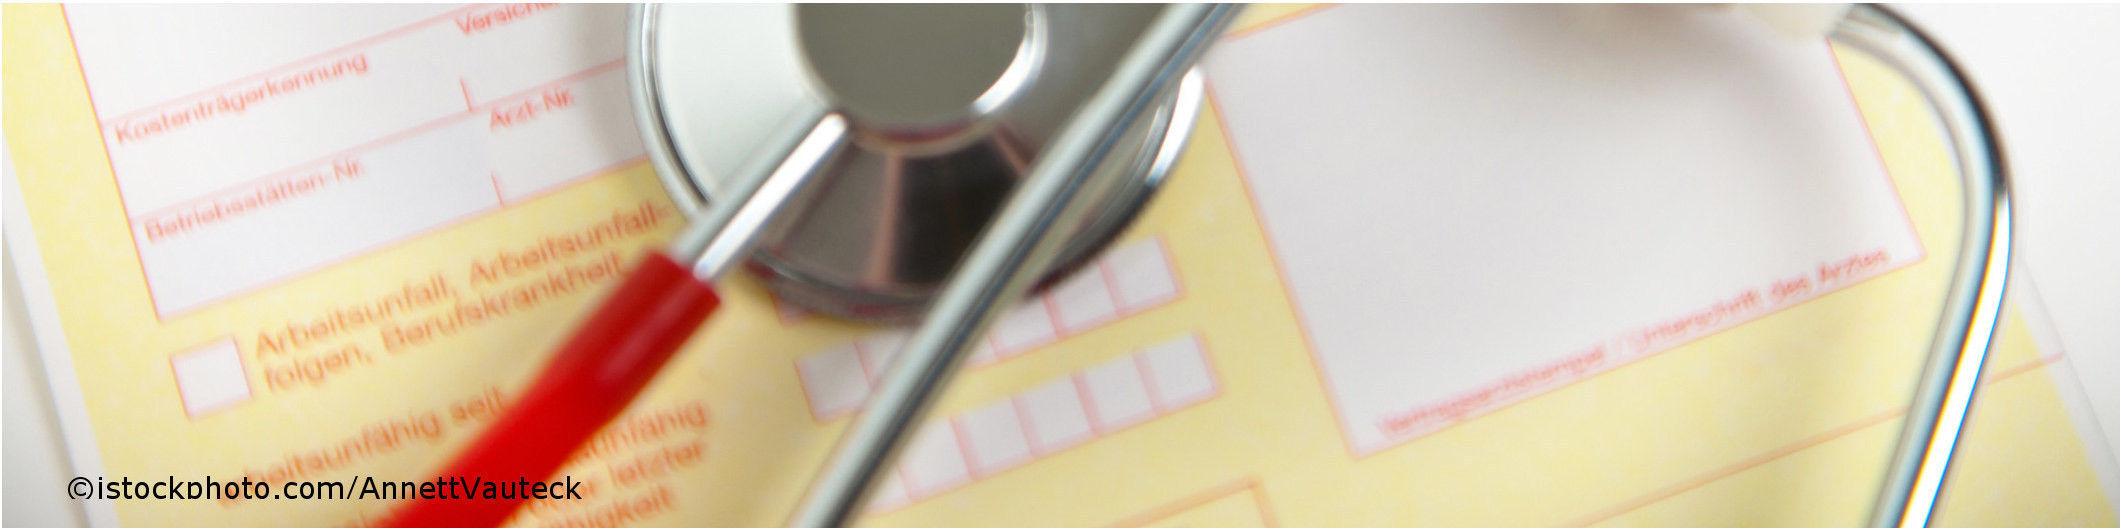 Im ICD-10 Diagnoseschlüssel steht B15 für akute Virushepatitis A